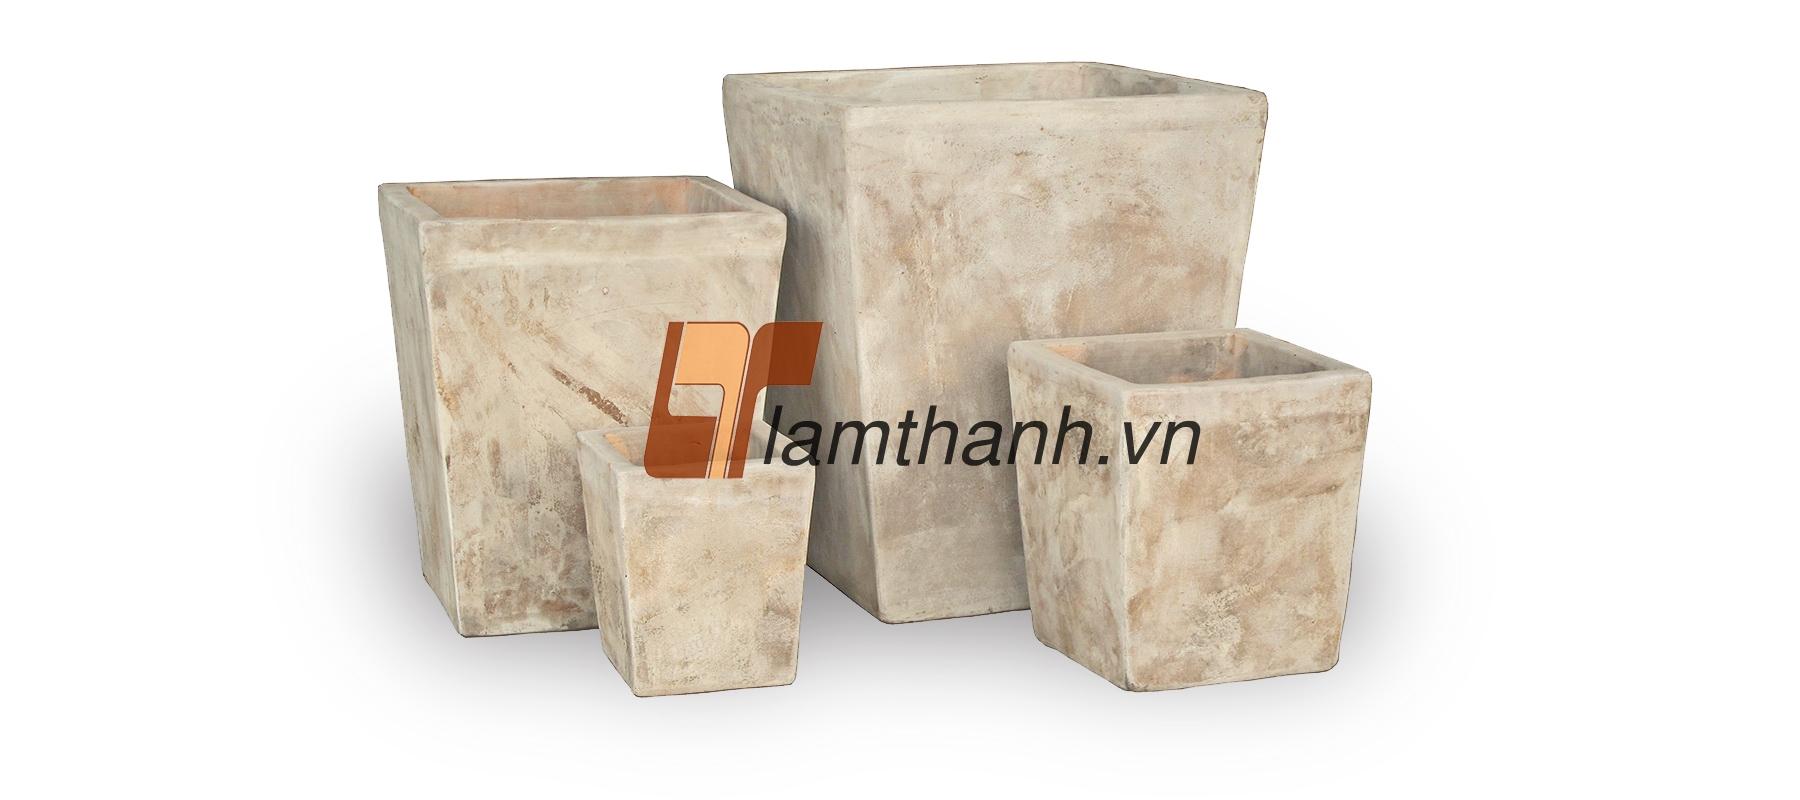 vietnam terracotta, polystone 09